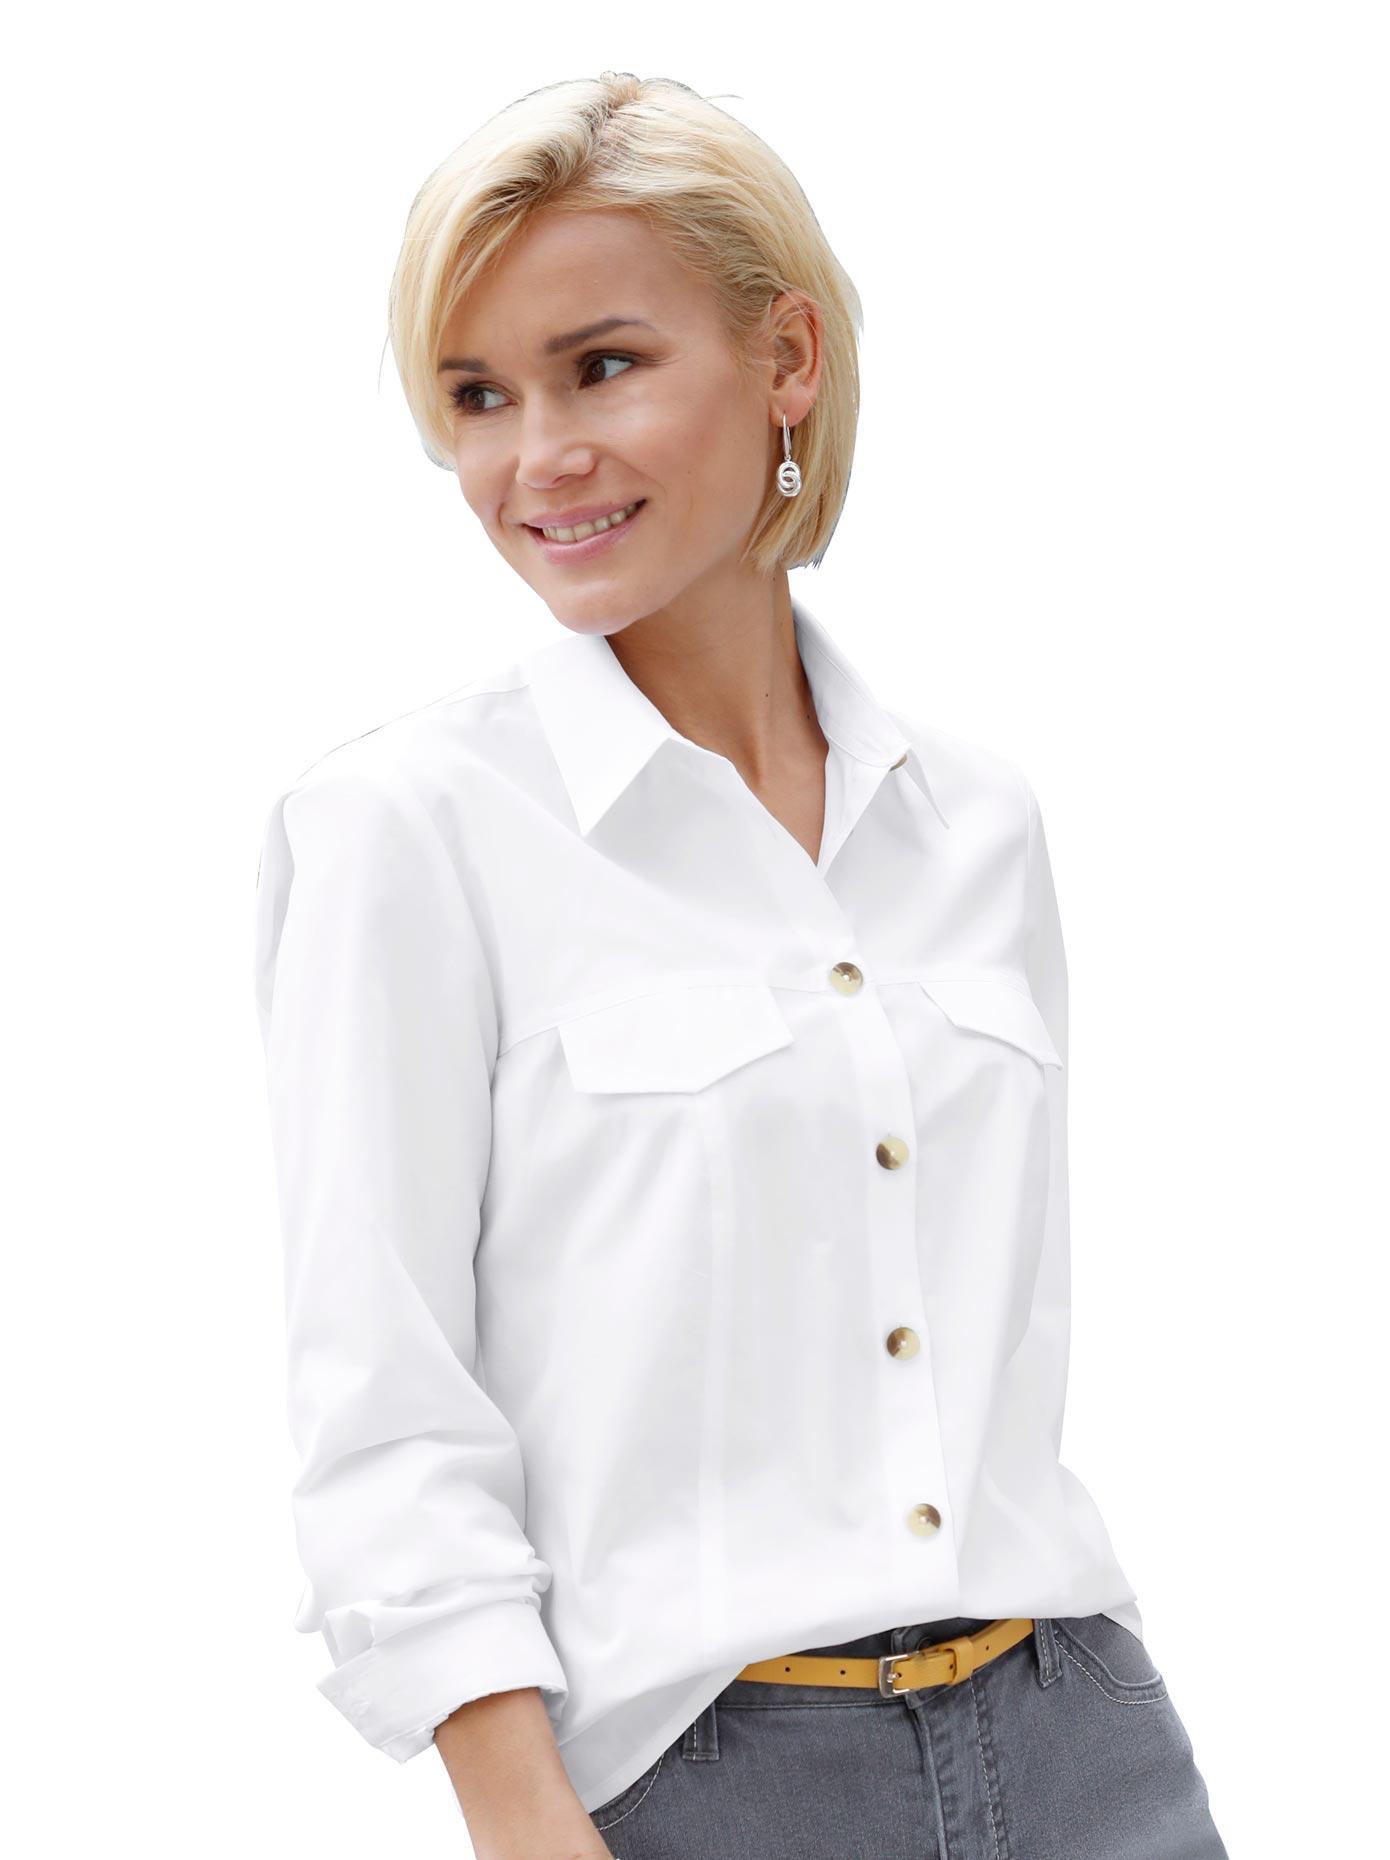 Casual Looks Bluse mit kontrastfarbigen Knöpfen